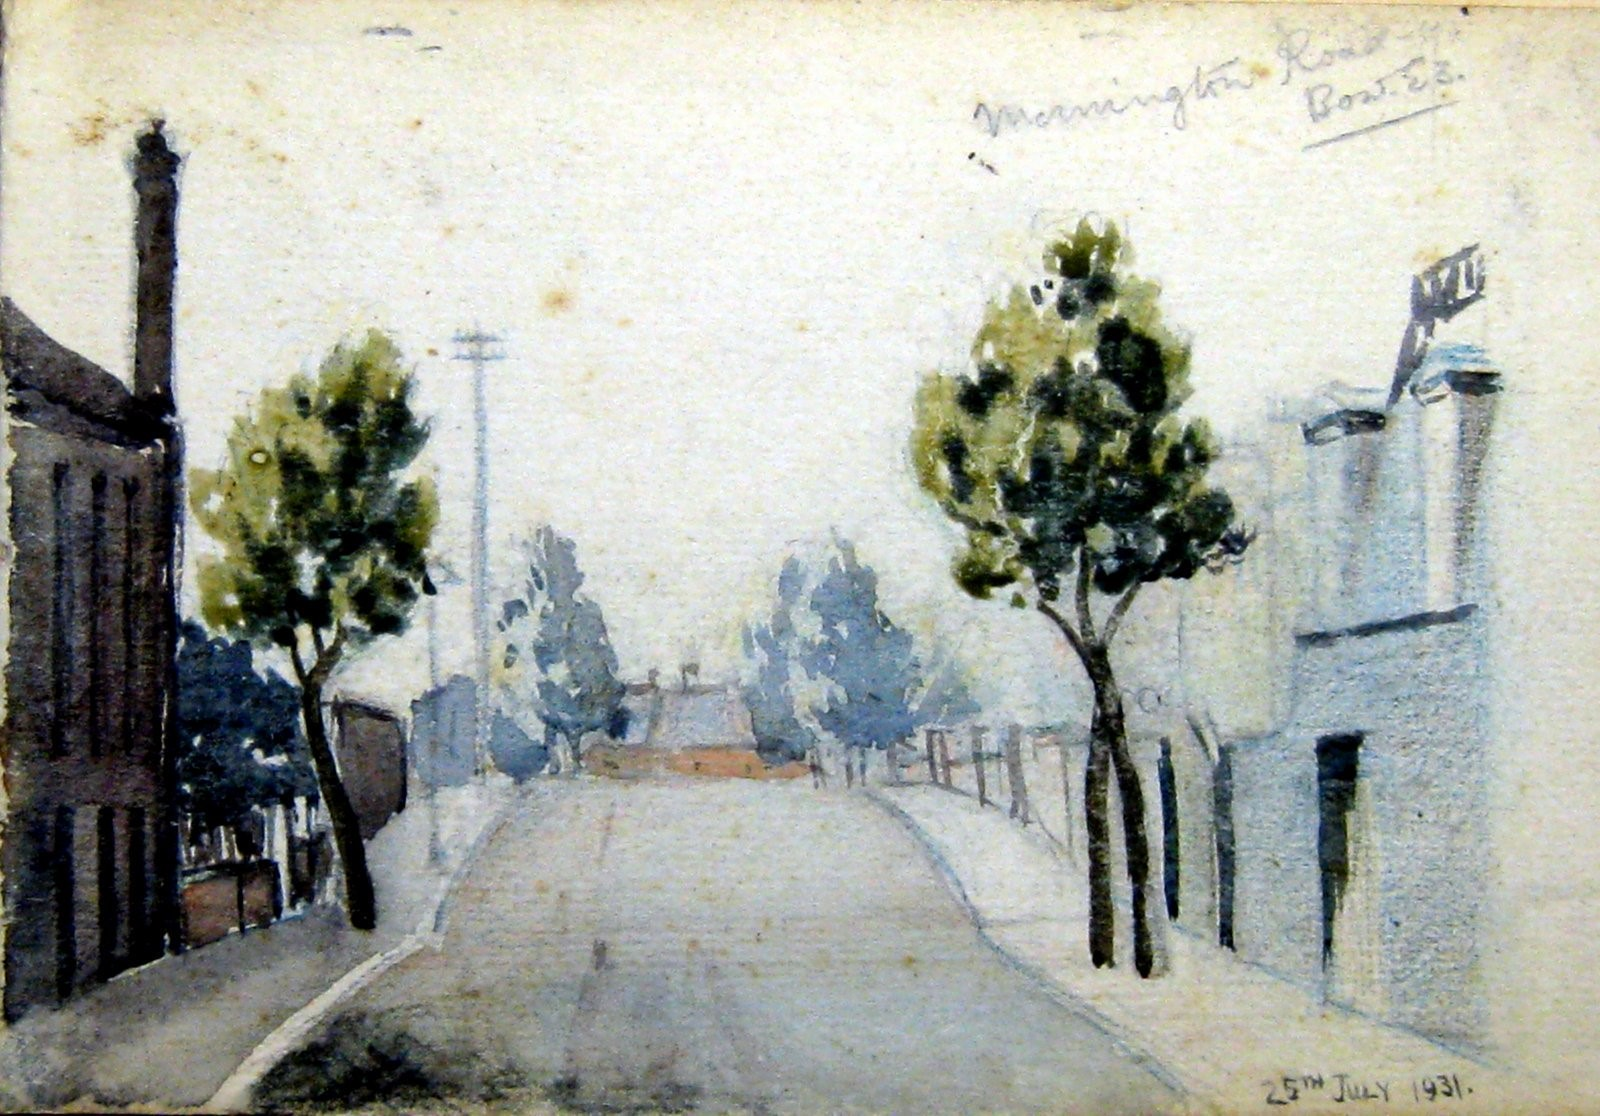 Steggles Mornington Road